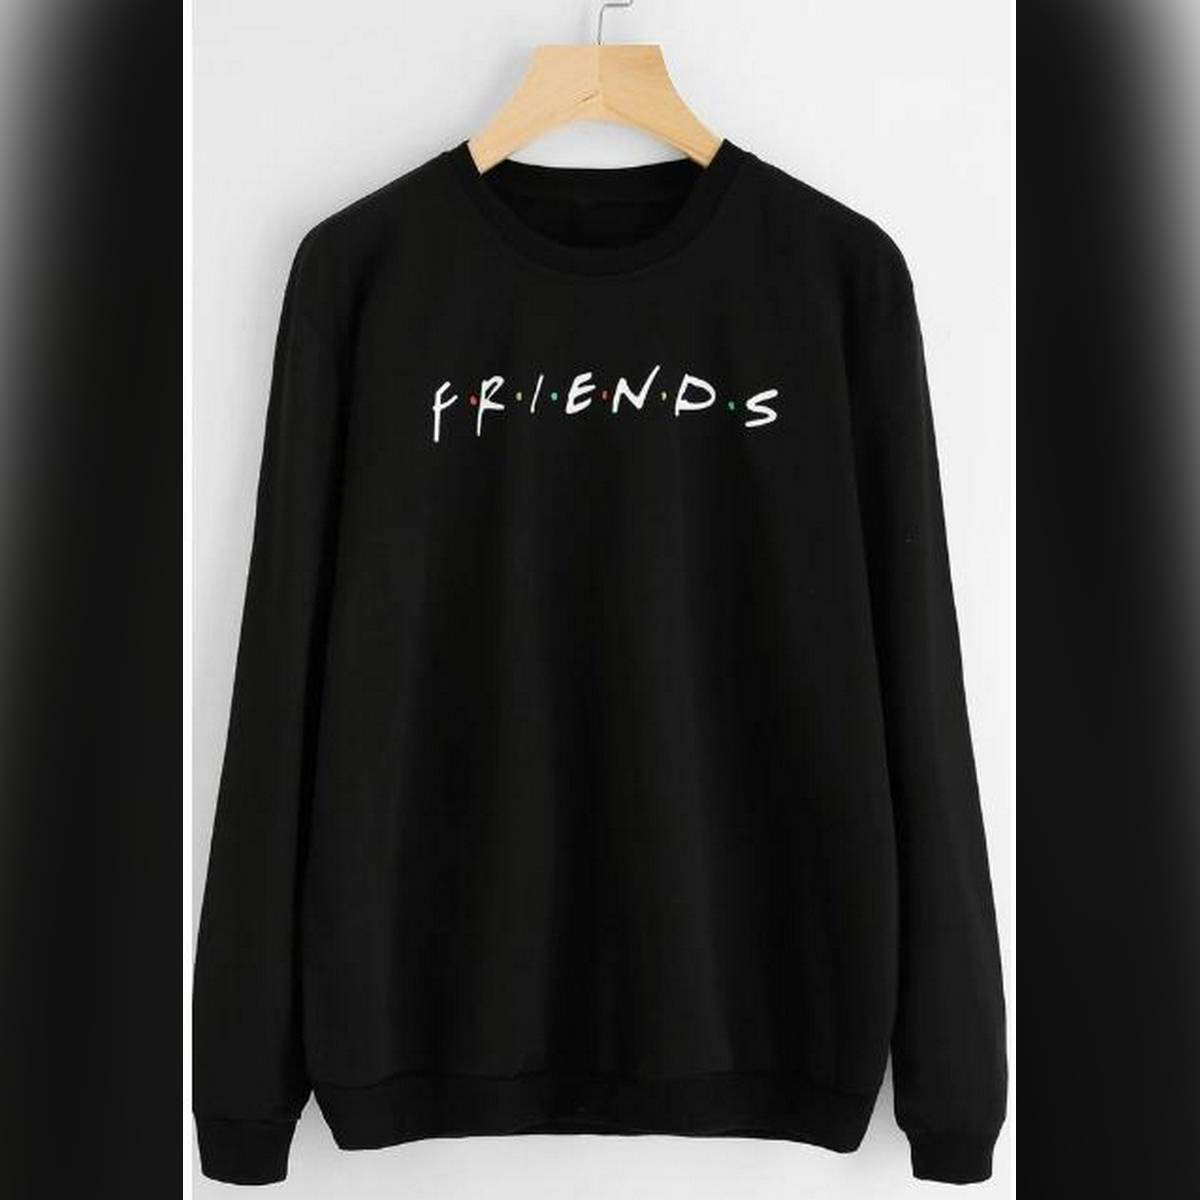 FRIENDS Printed Sweatshirt Black  For Women